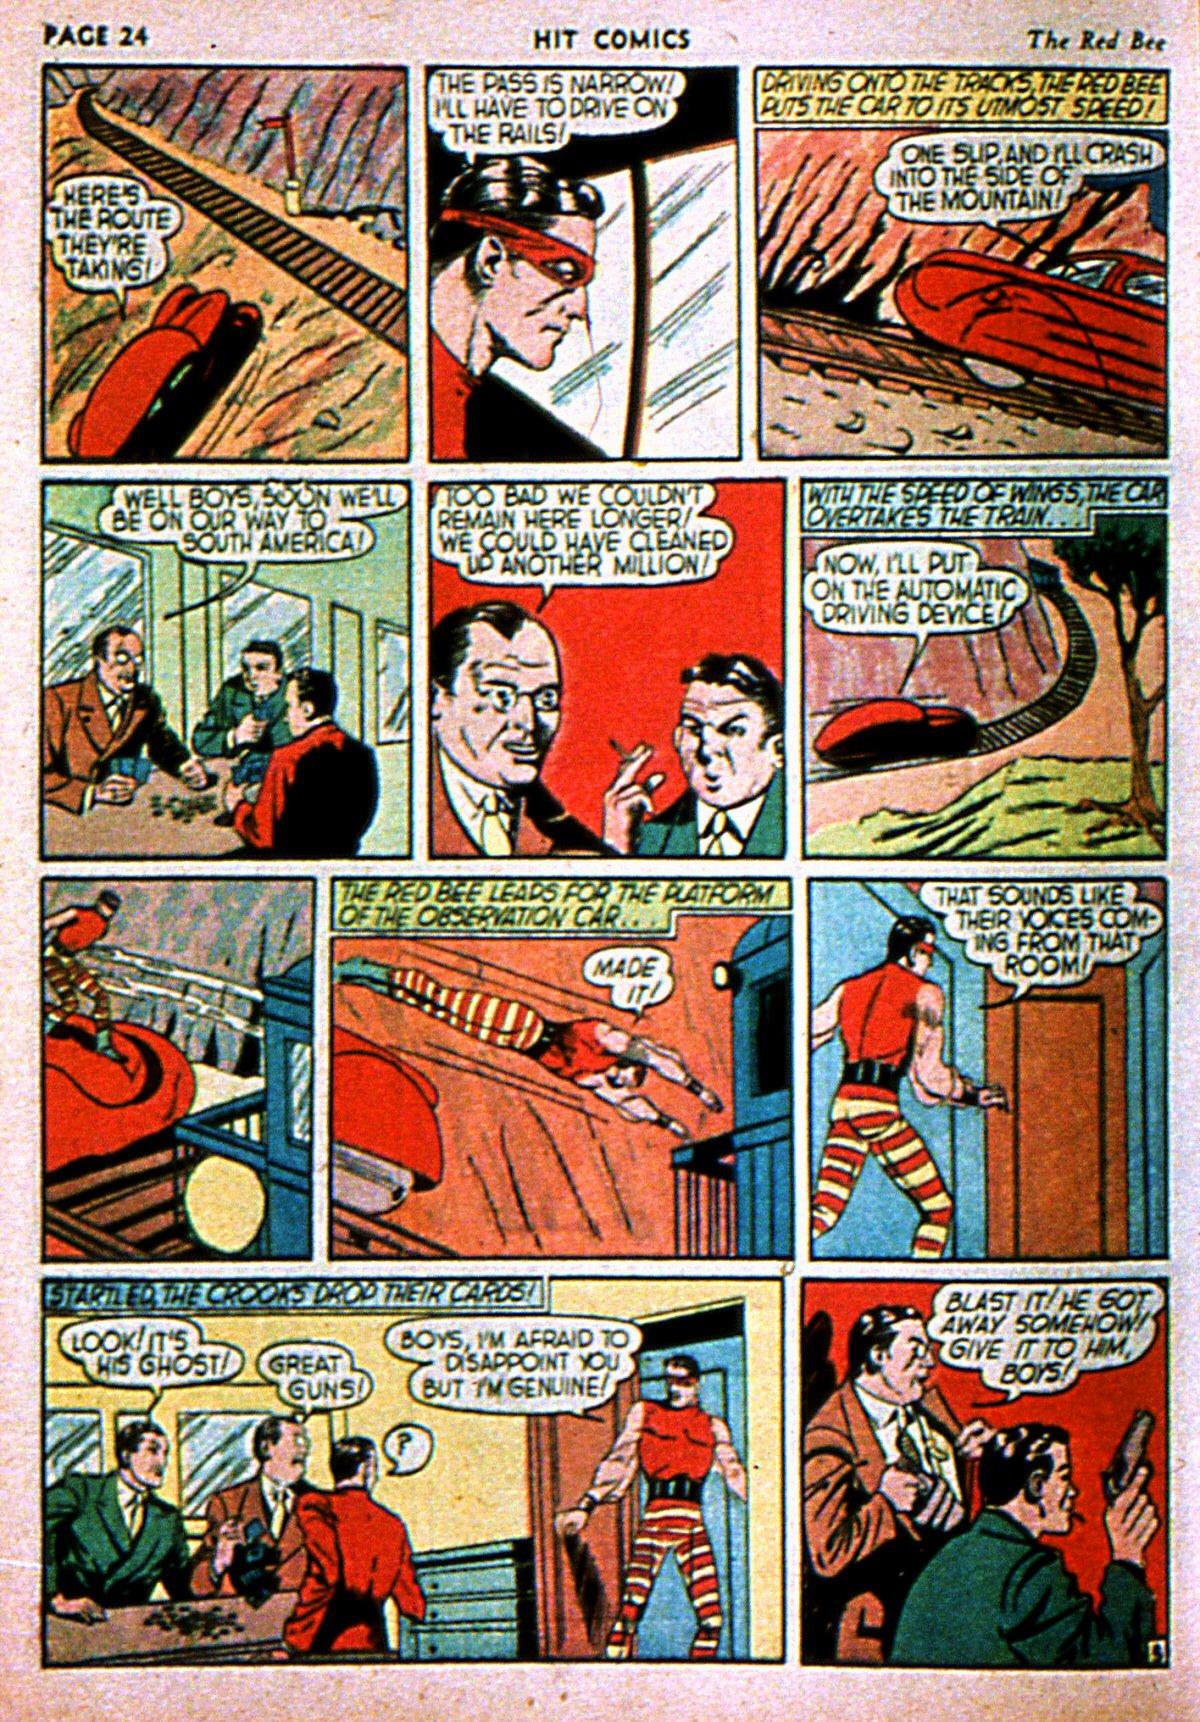 Read online Hit Comics comic -  Issue #3 - 26